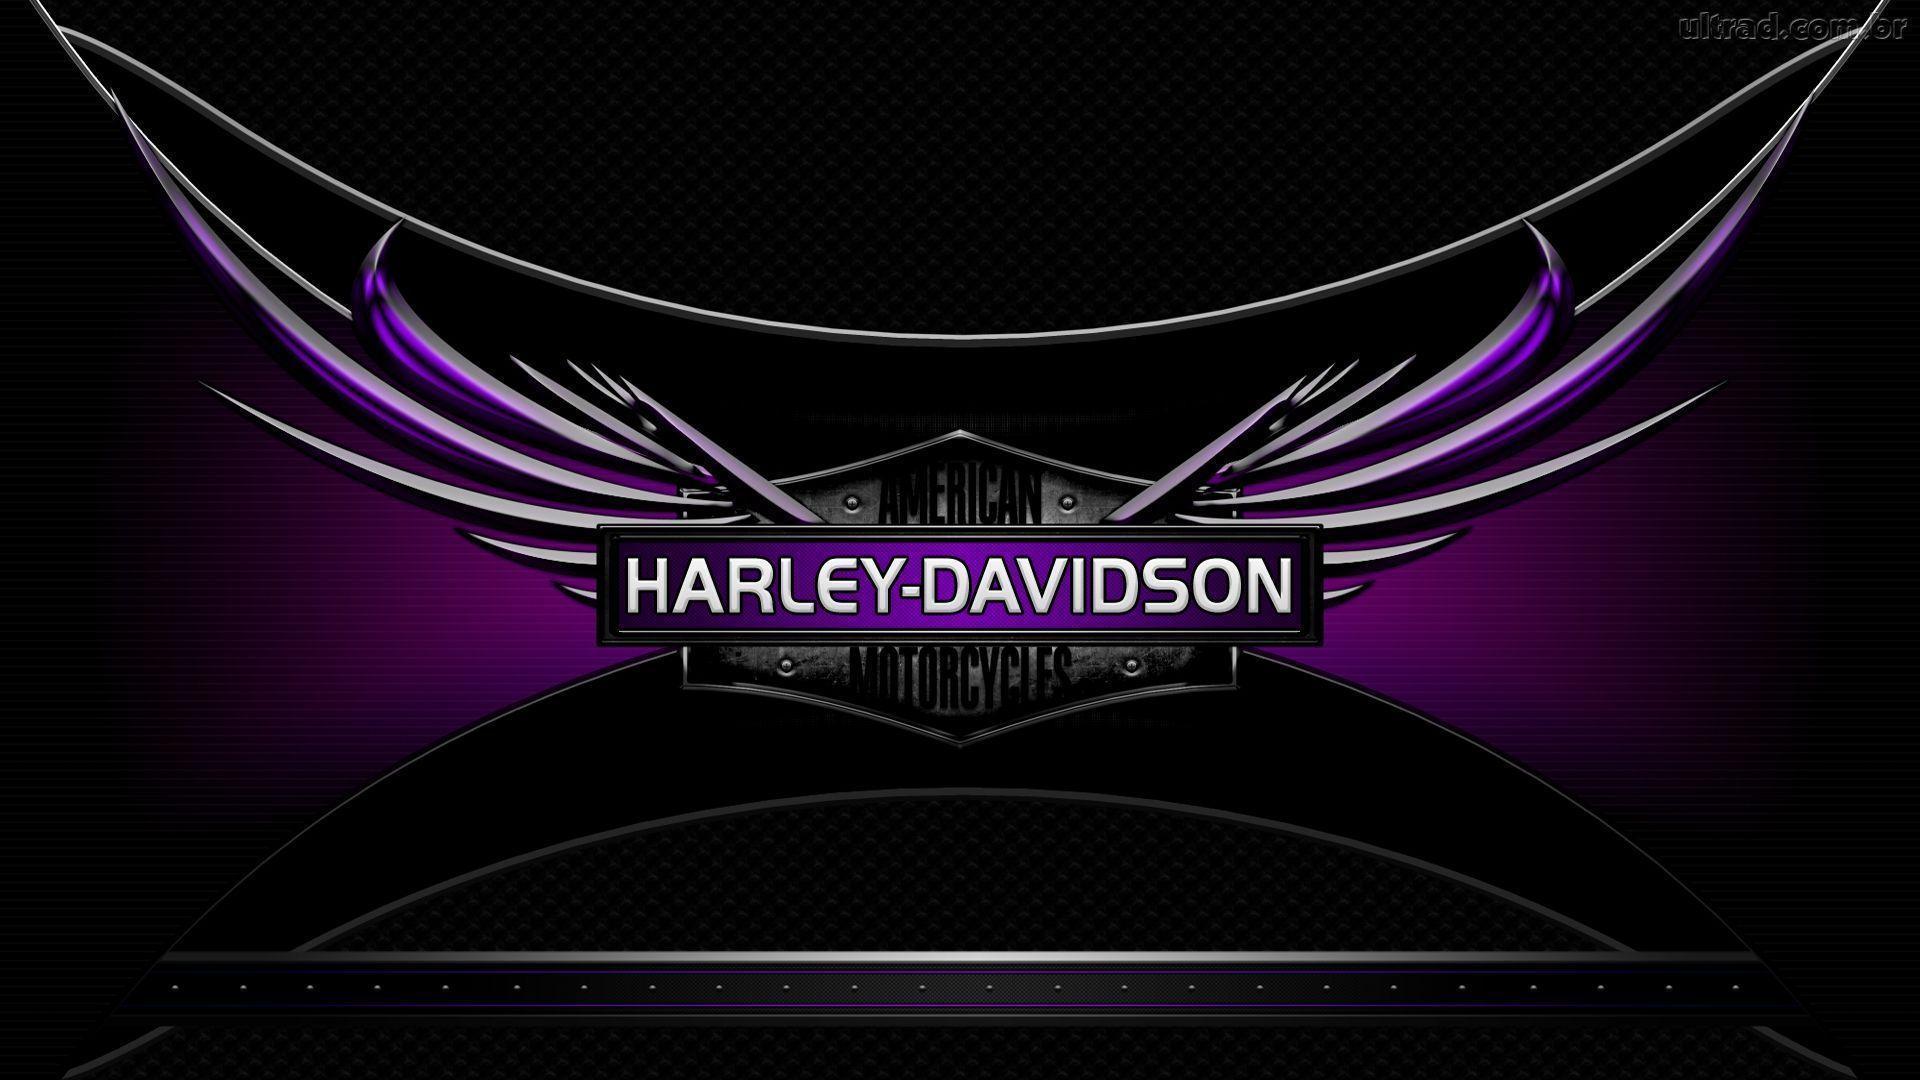 harley davidson logo wallpapers wallpaper cave harley davidson logo wallpaper free harley davidson logo wallpaper free